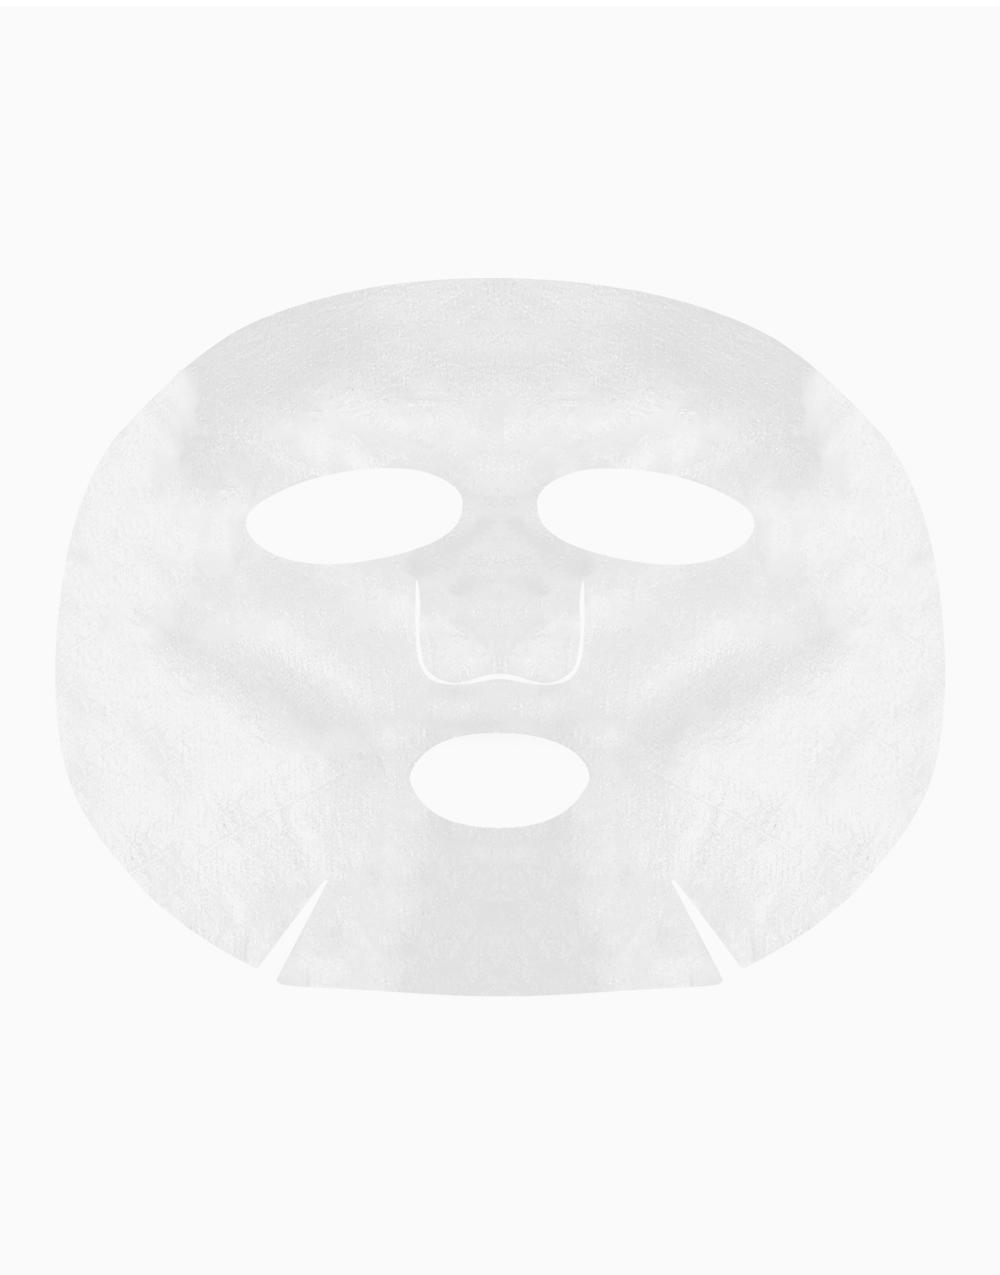 Pure Skin Egg Essence Mask Sheet by Esfolio